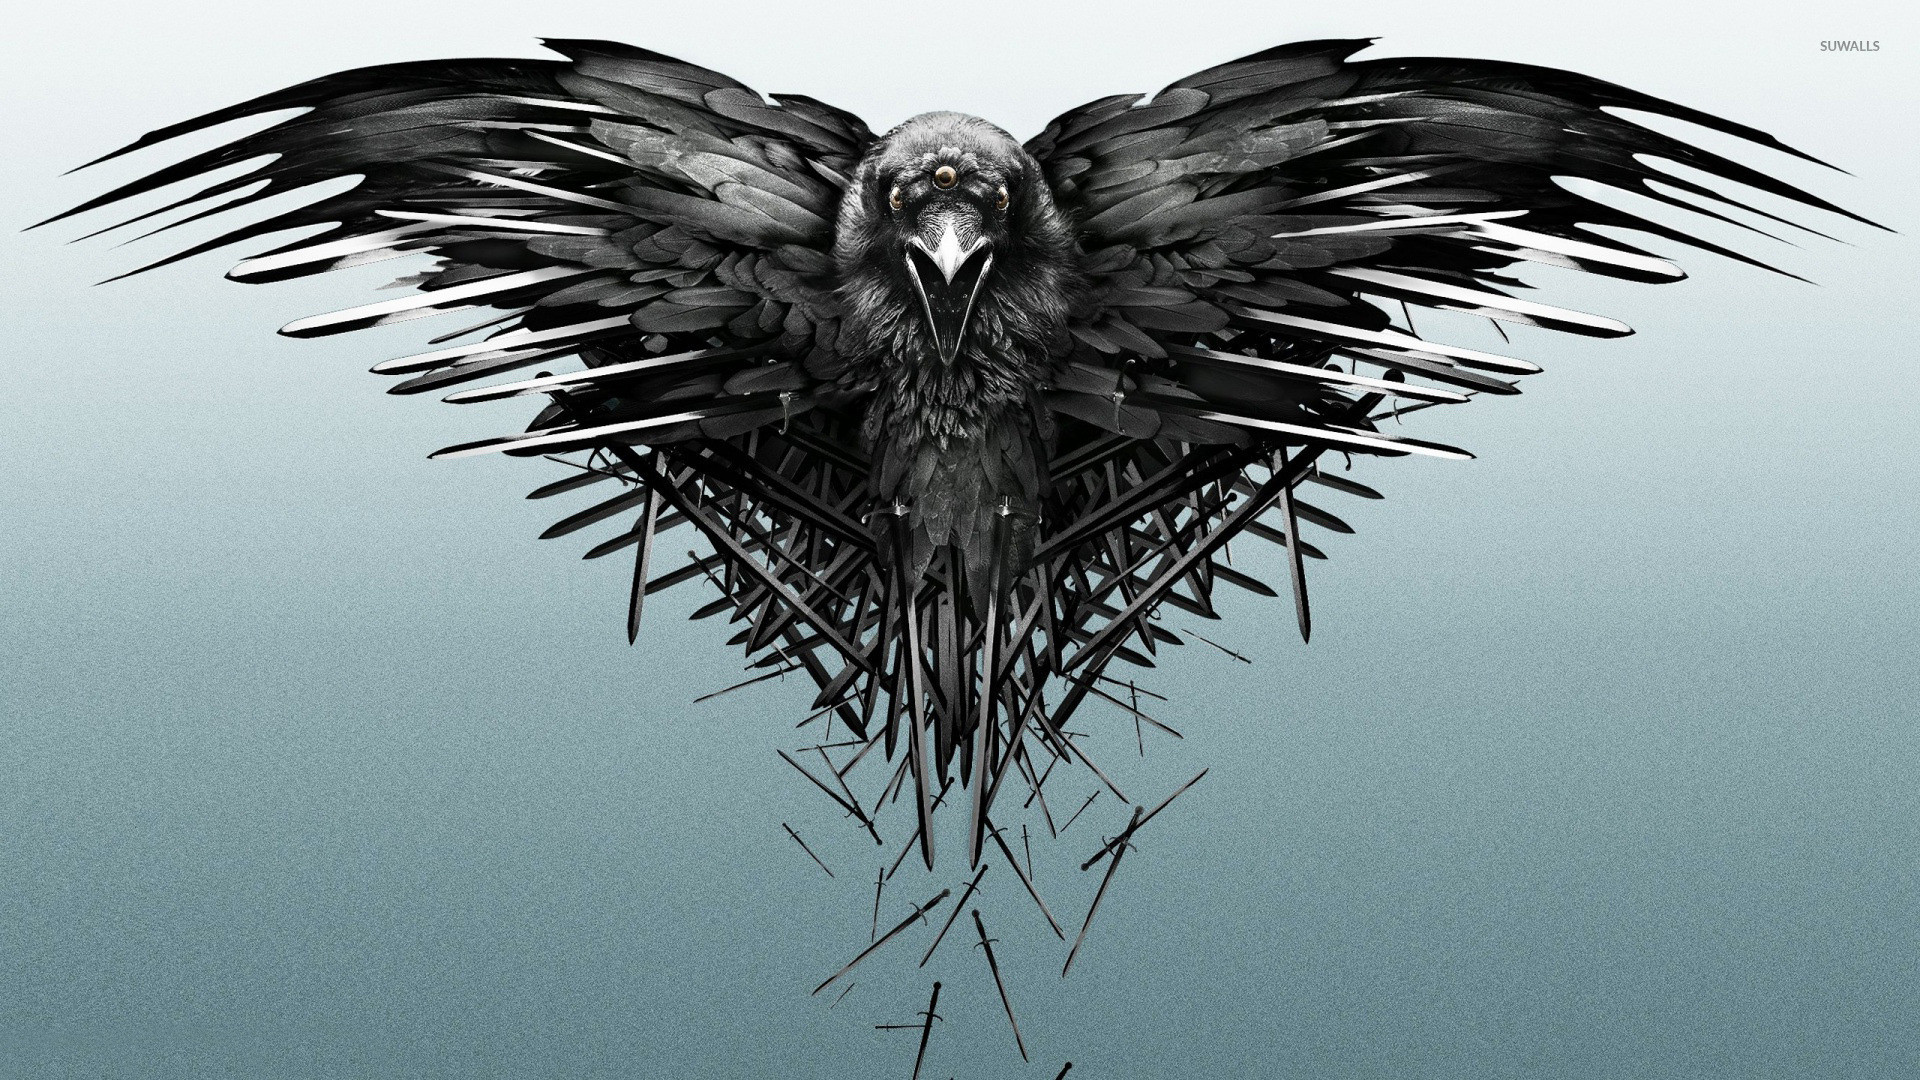 The three-eyed raven – Game of Thrones wallpaper jpg